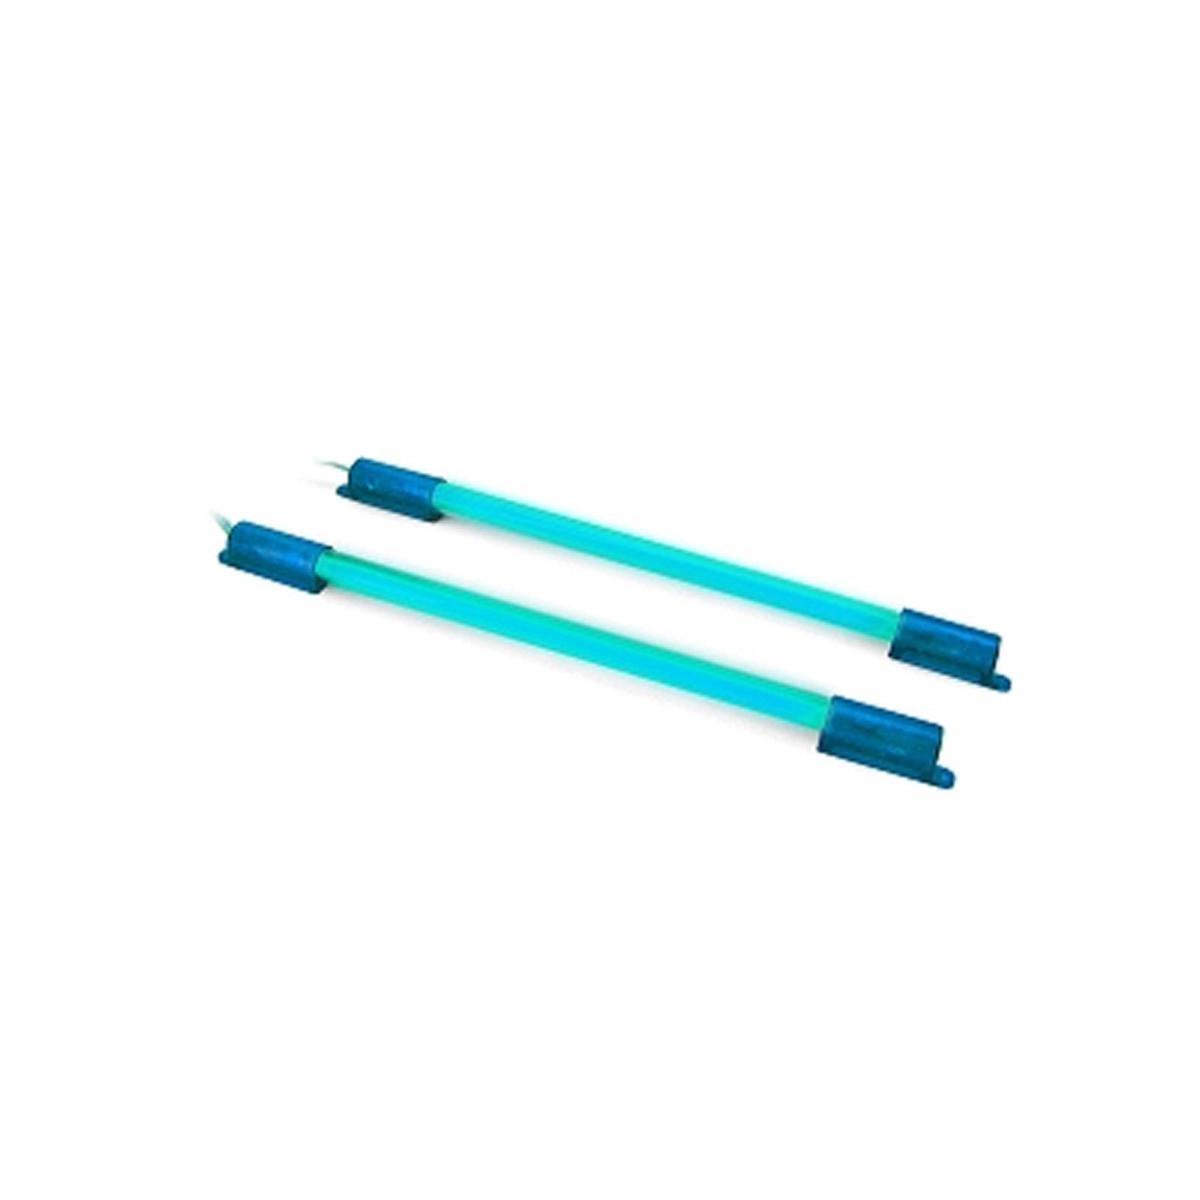 Barette de Néons - Bleu